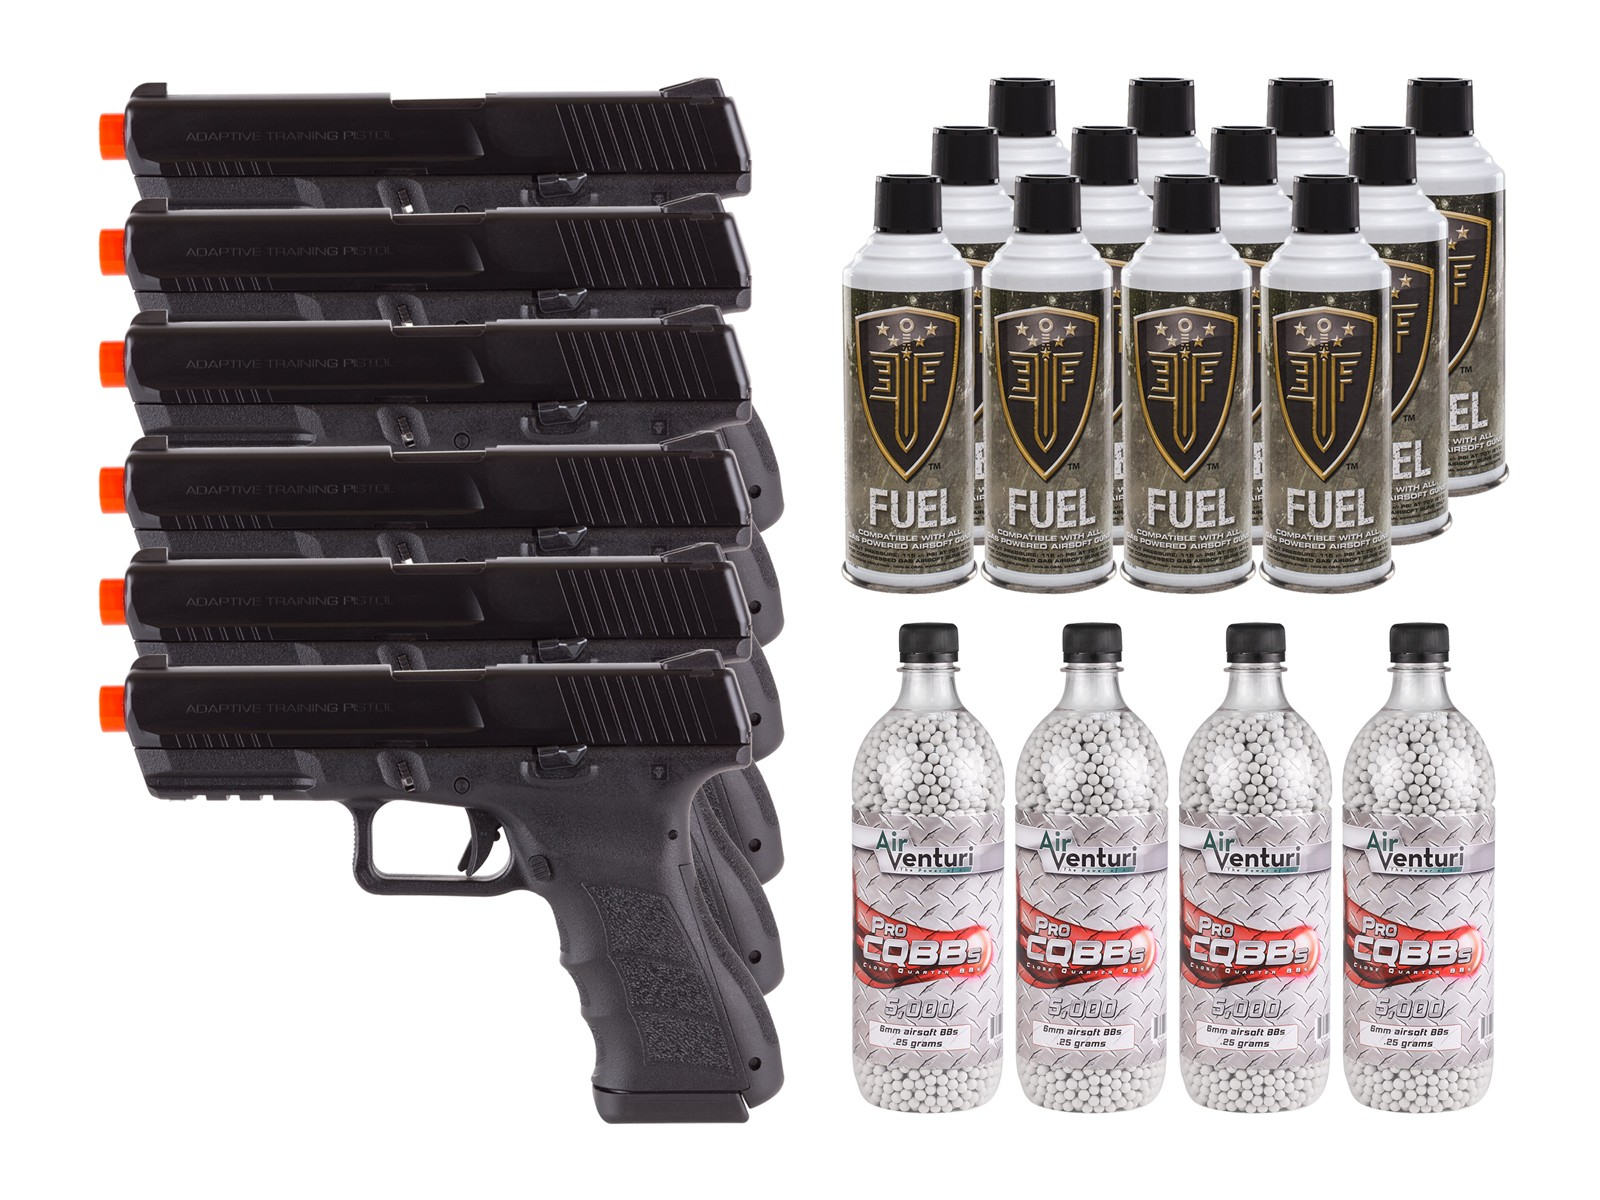 KWA ATP Adaptive Training Airsoft Pistol, 6 Pack 6mm